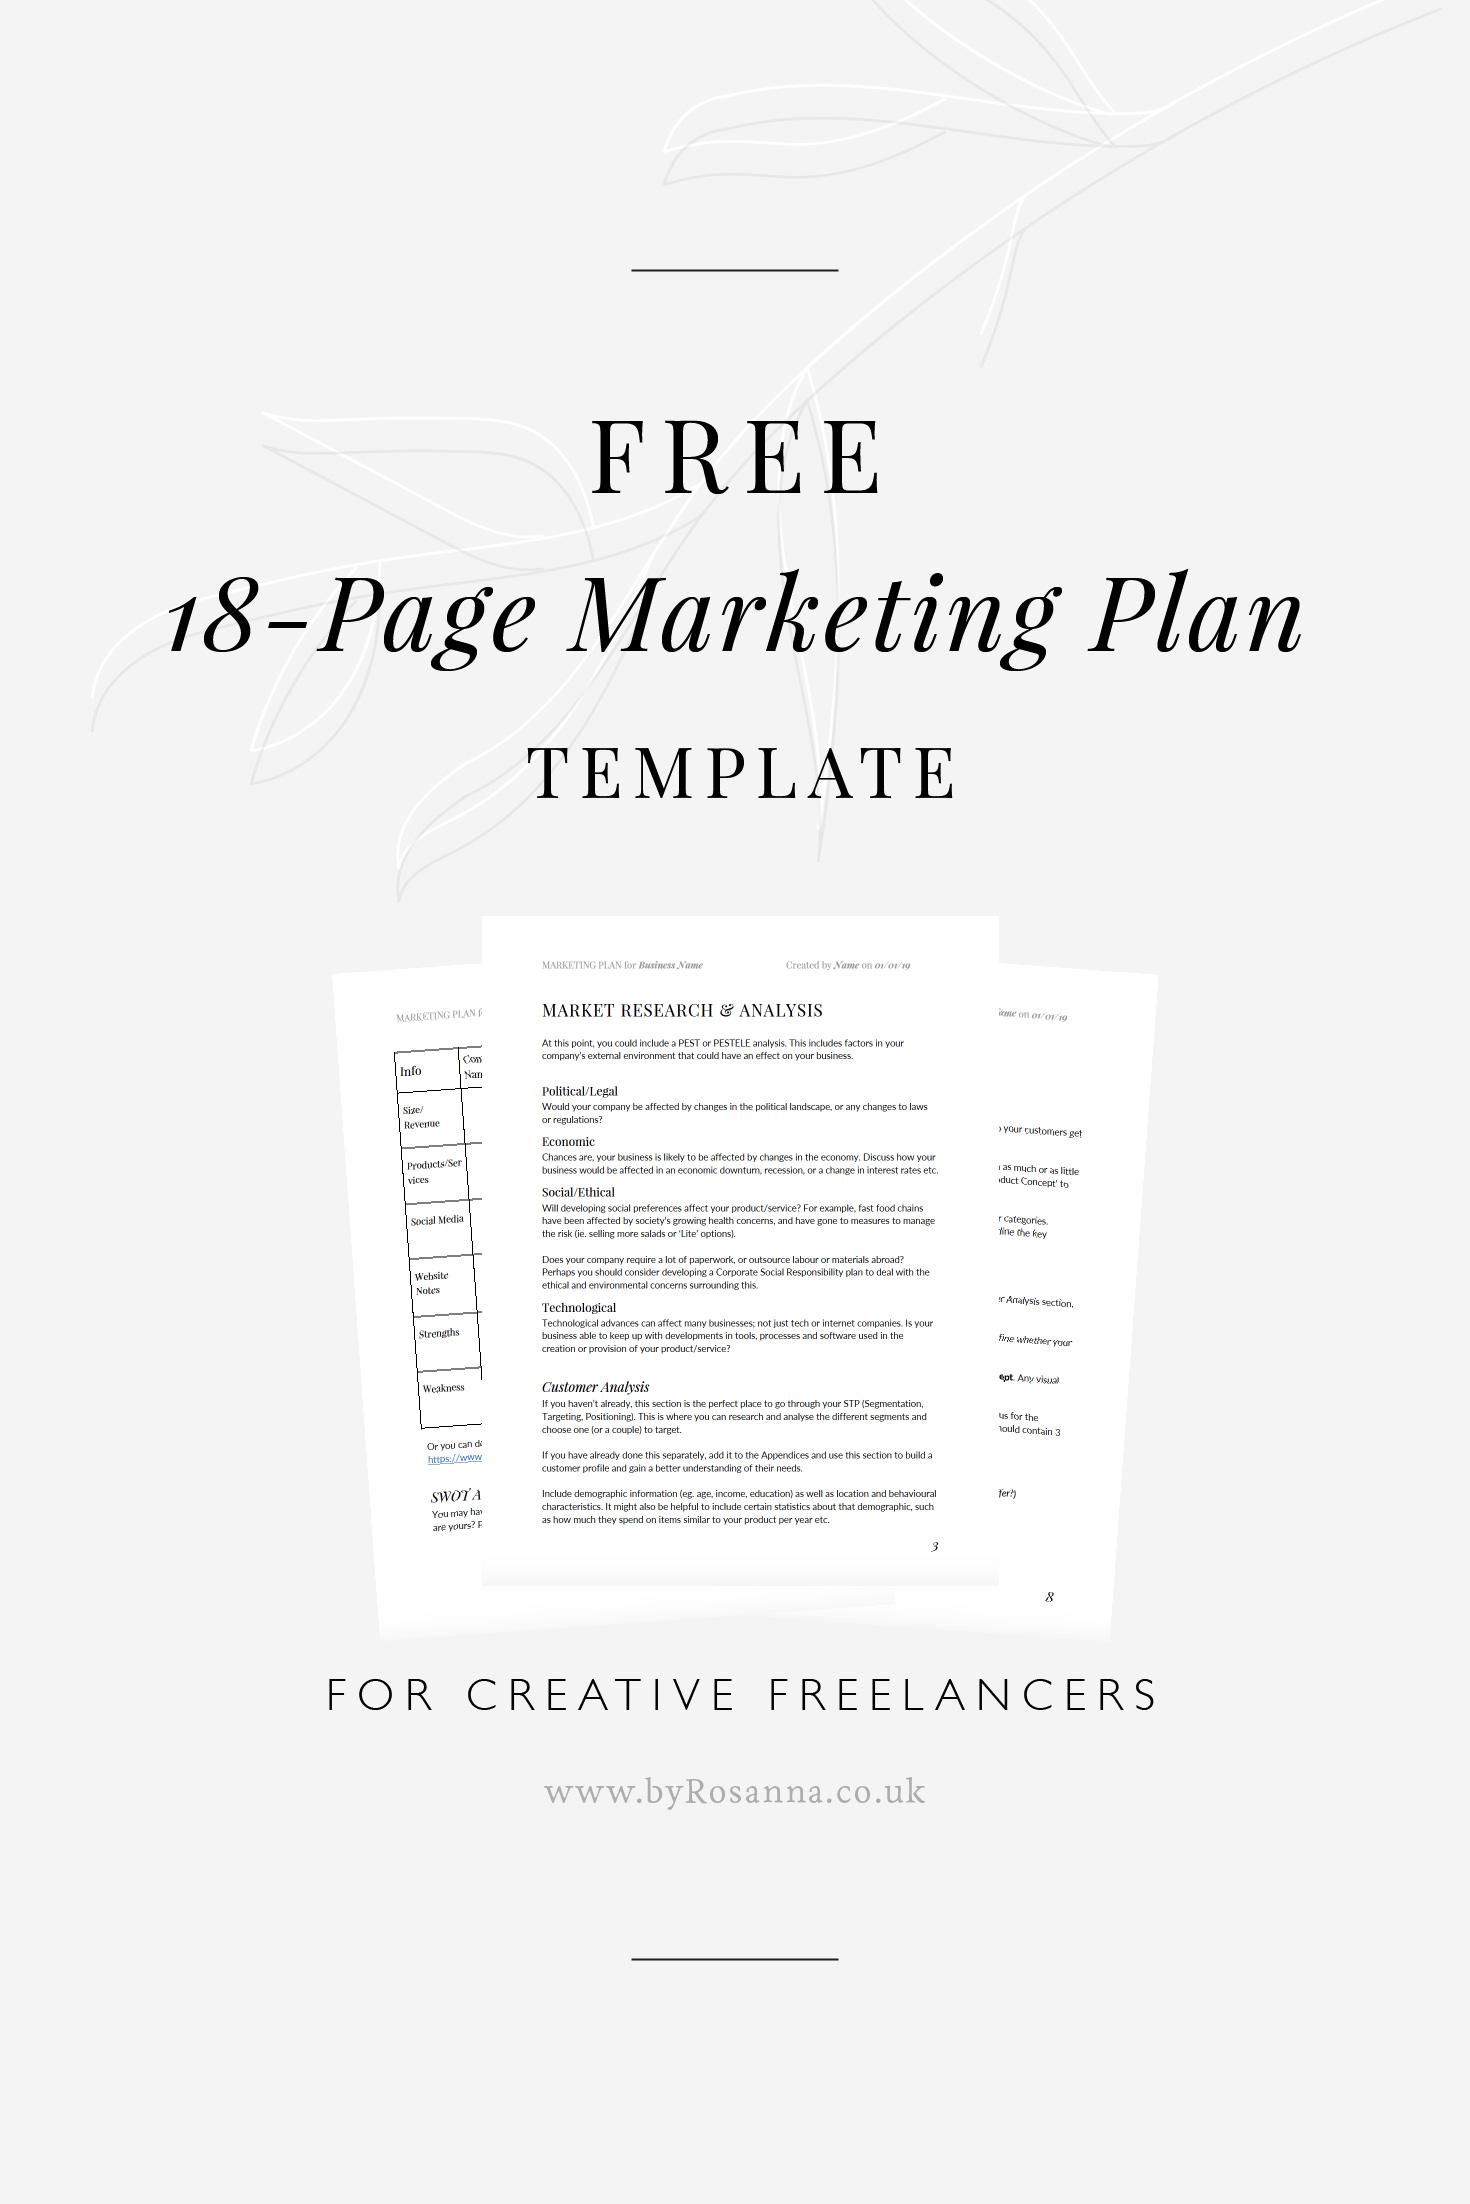 Get A Free Marketing Plan Template Byrosanna Squarespace